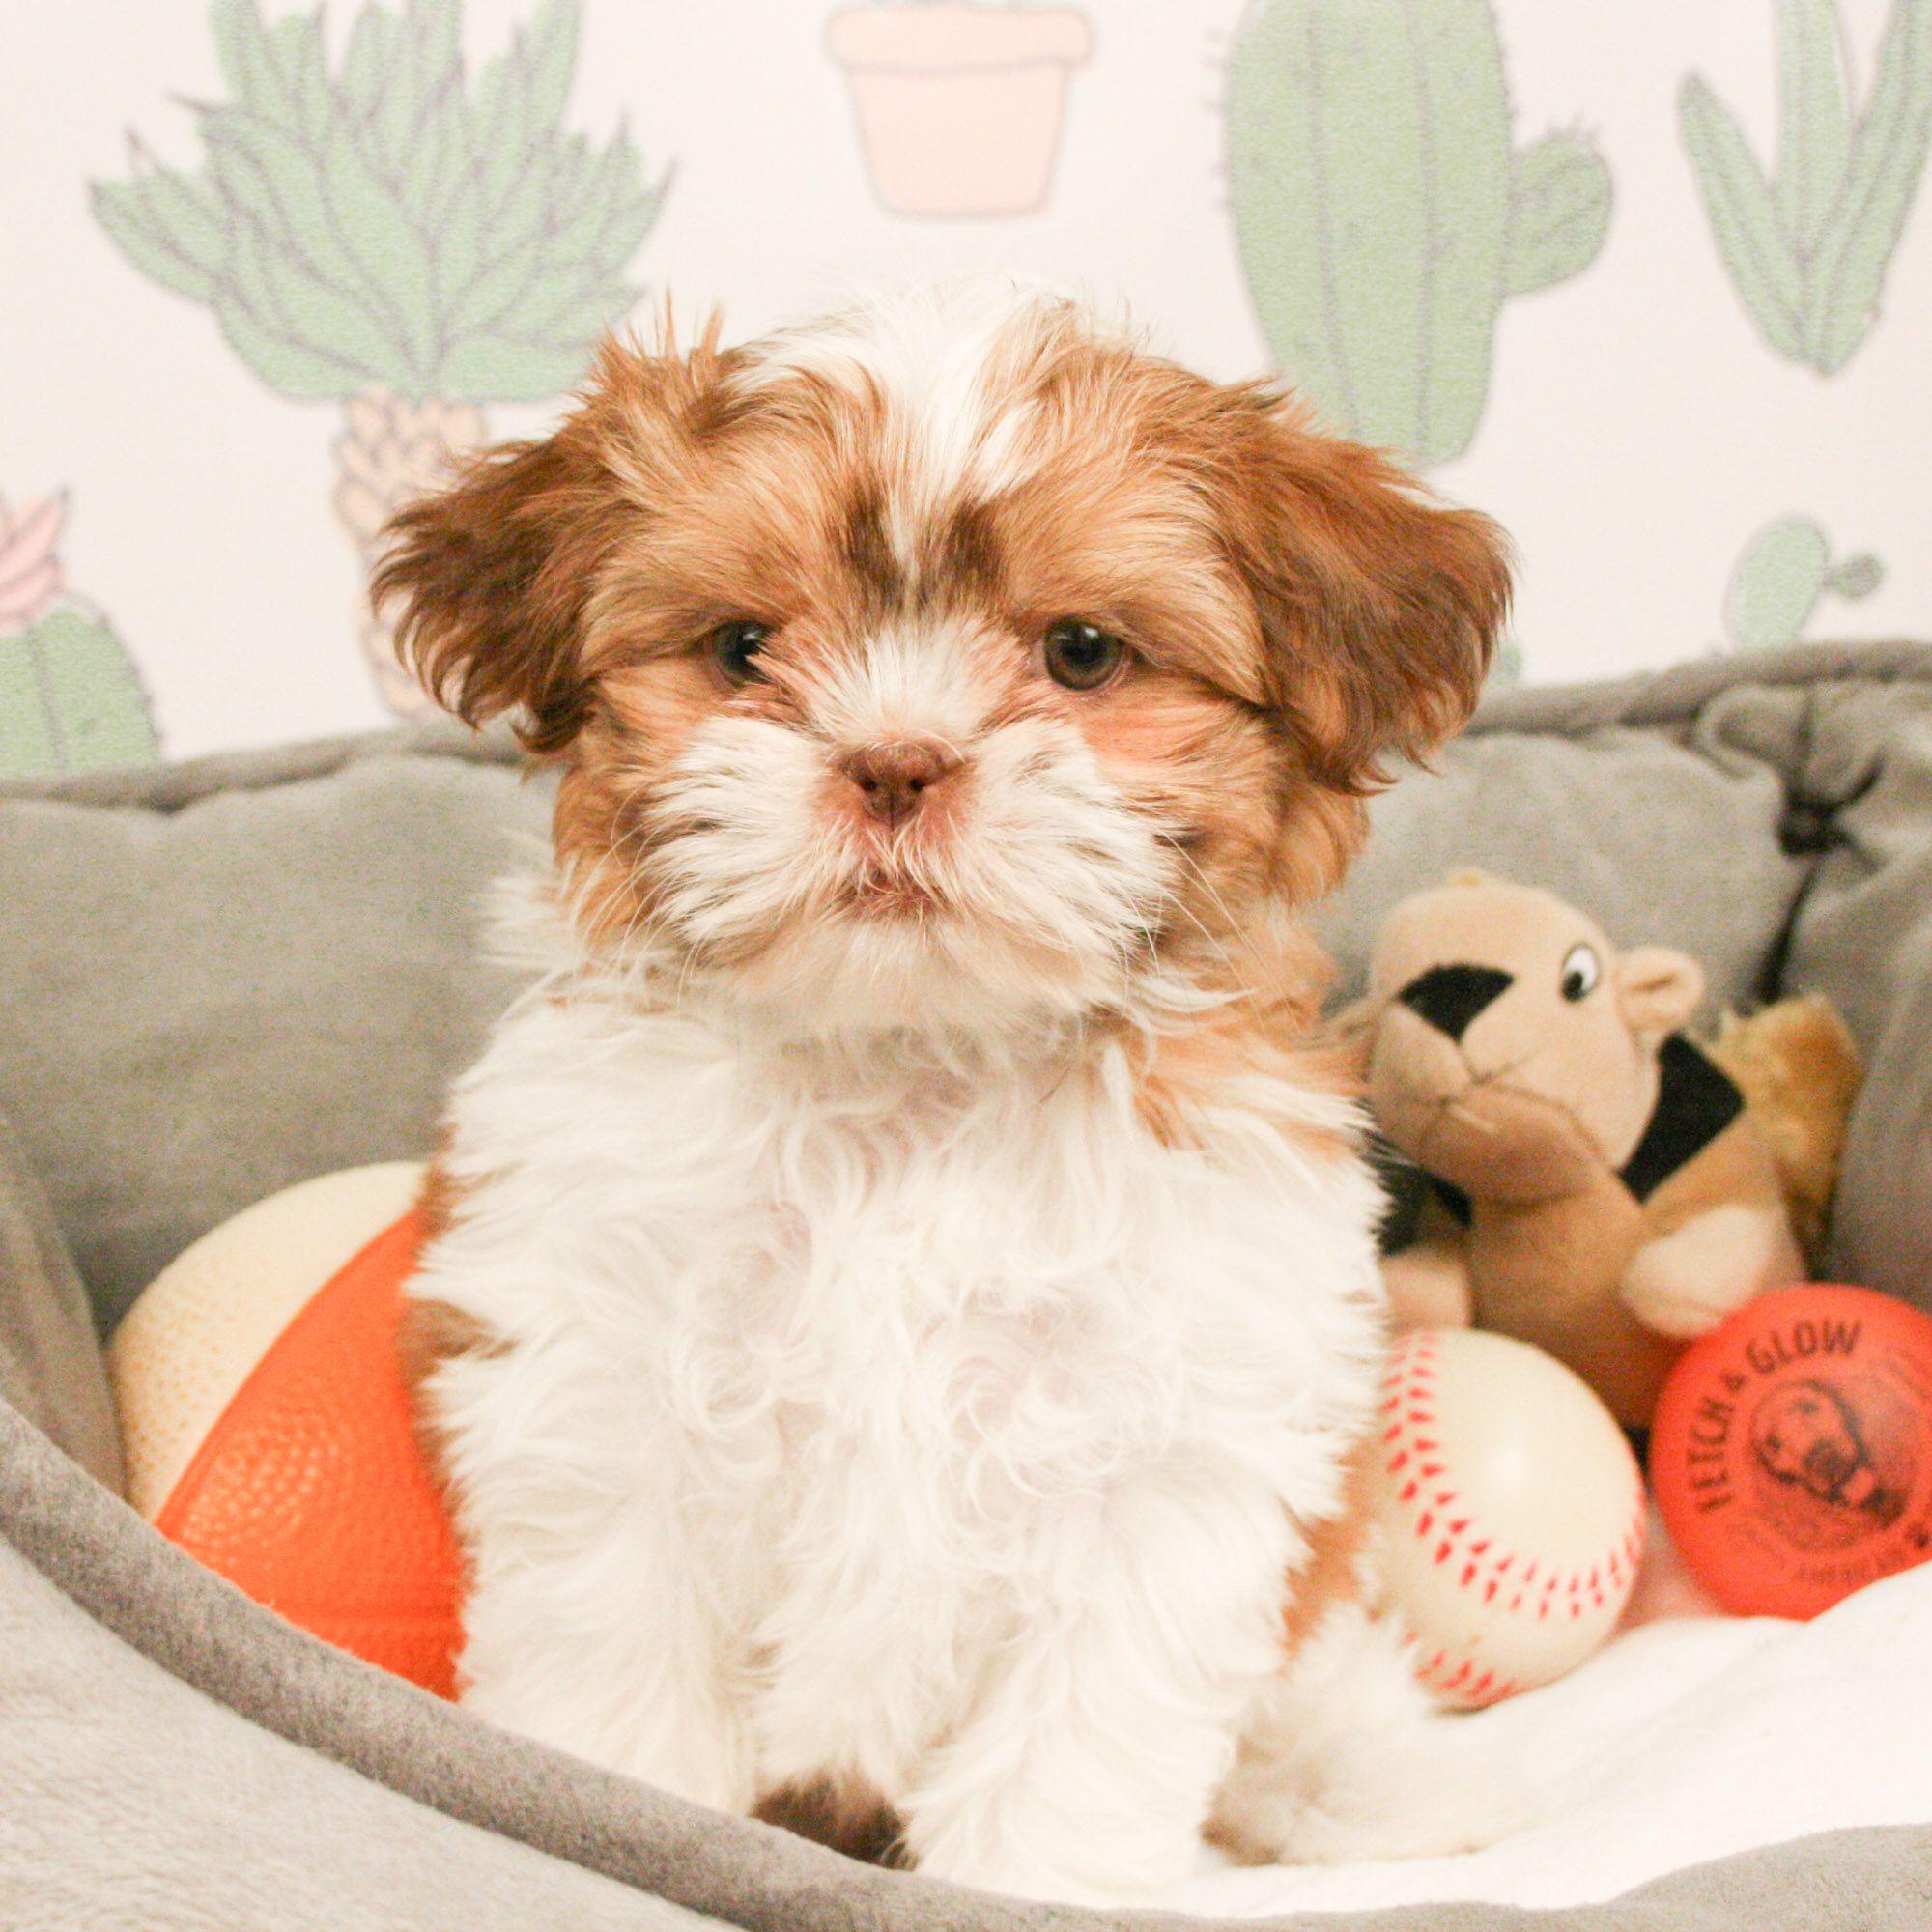 Shih Tzu Puppies For Sale Shih Tzu Puppy Puppies Lap Dogs